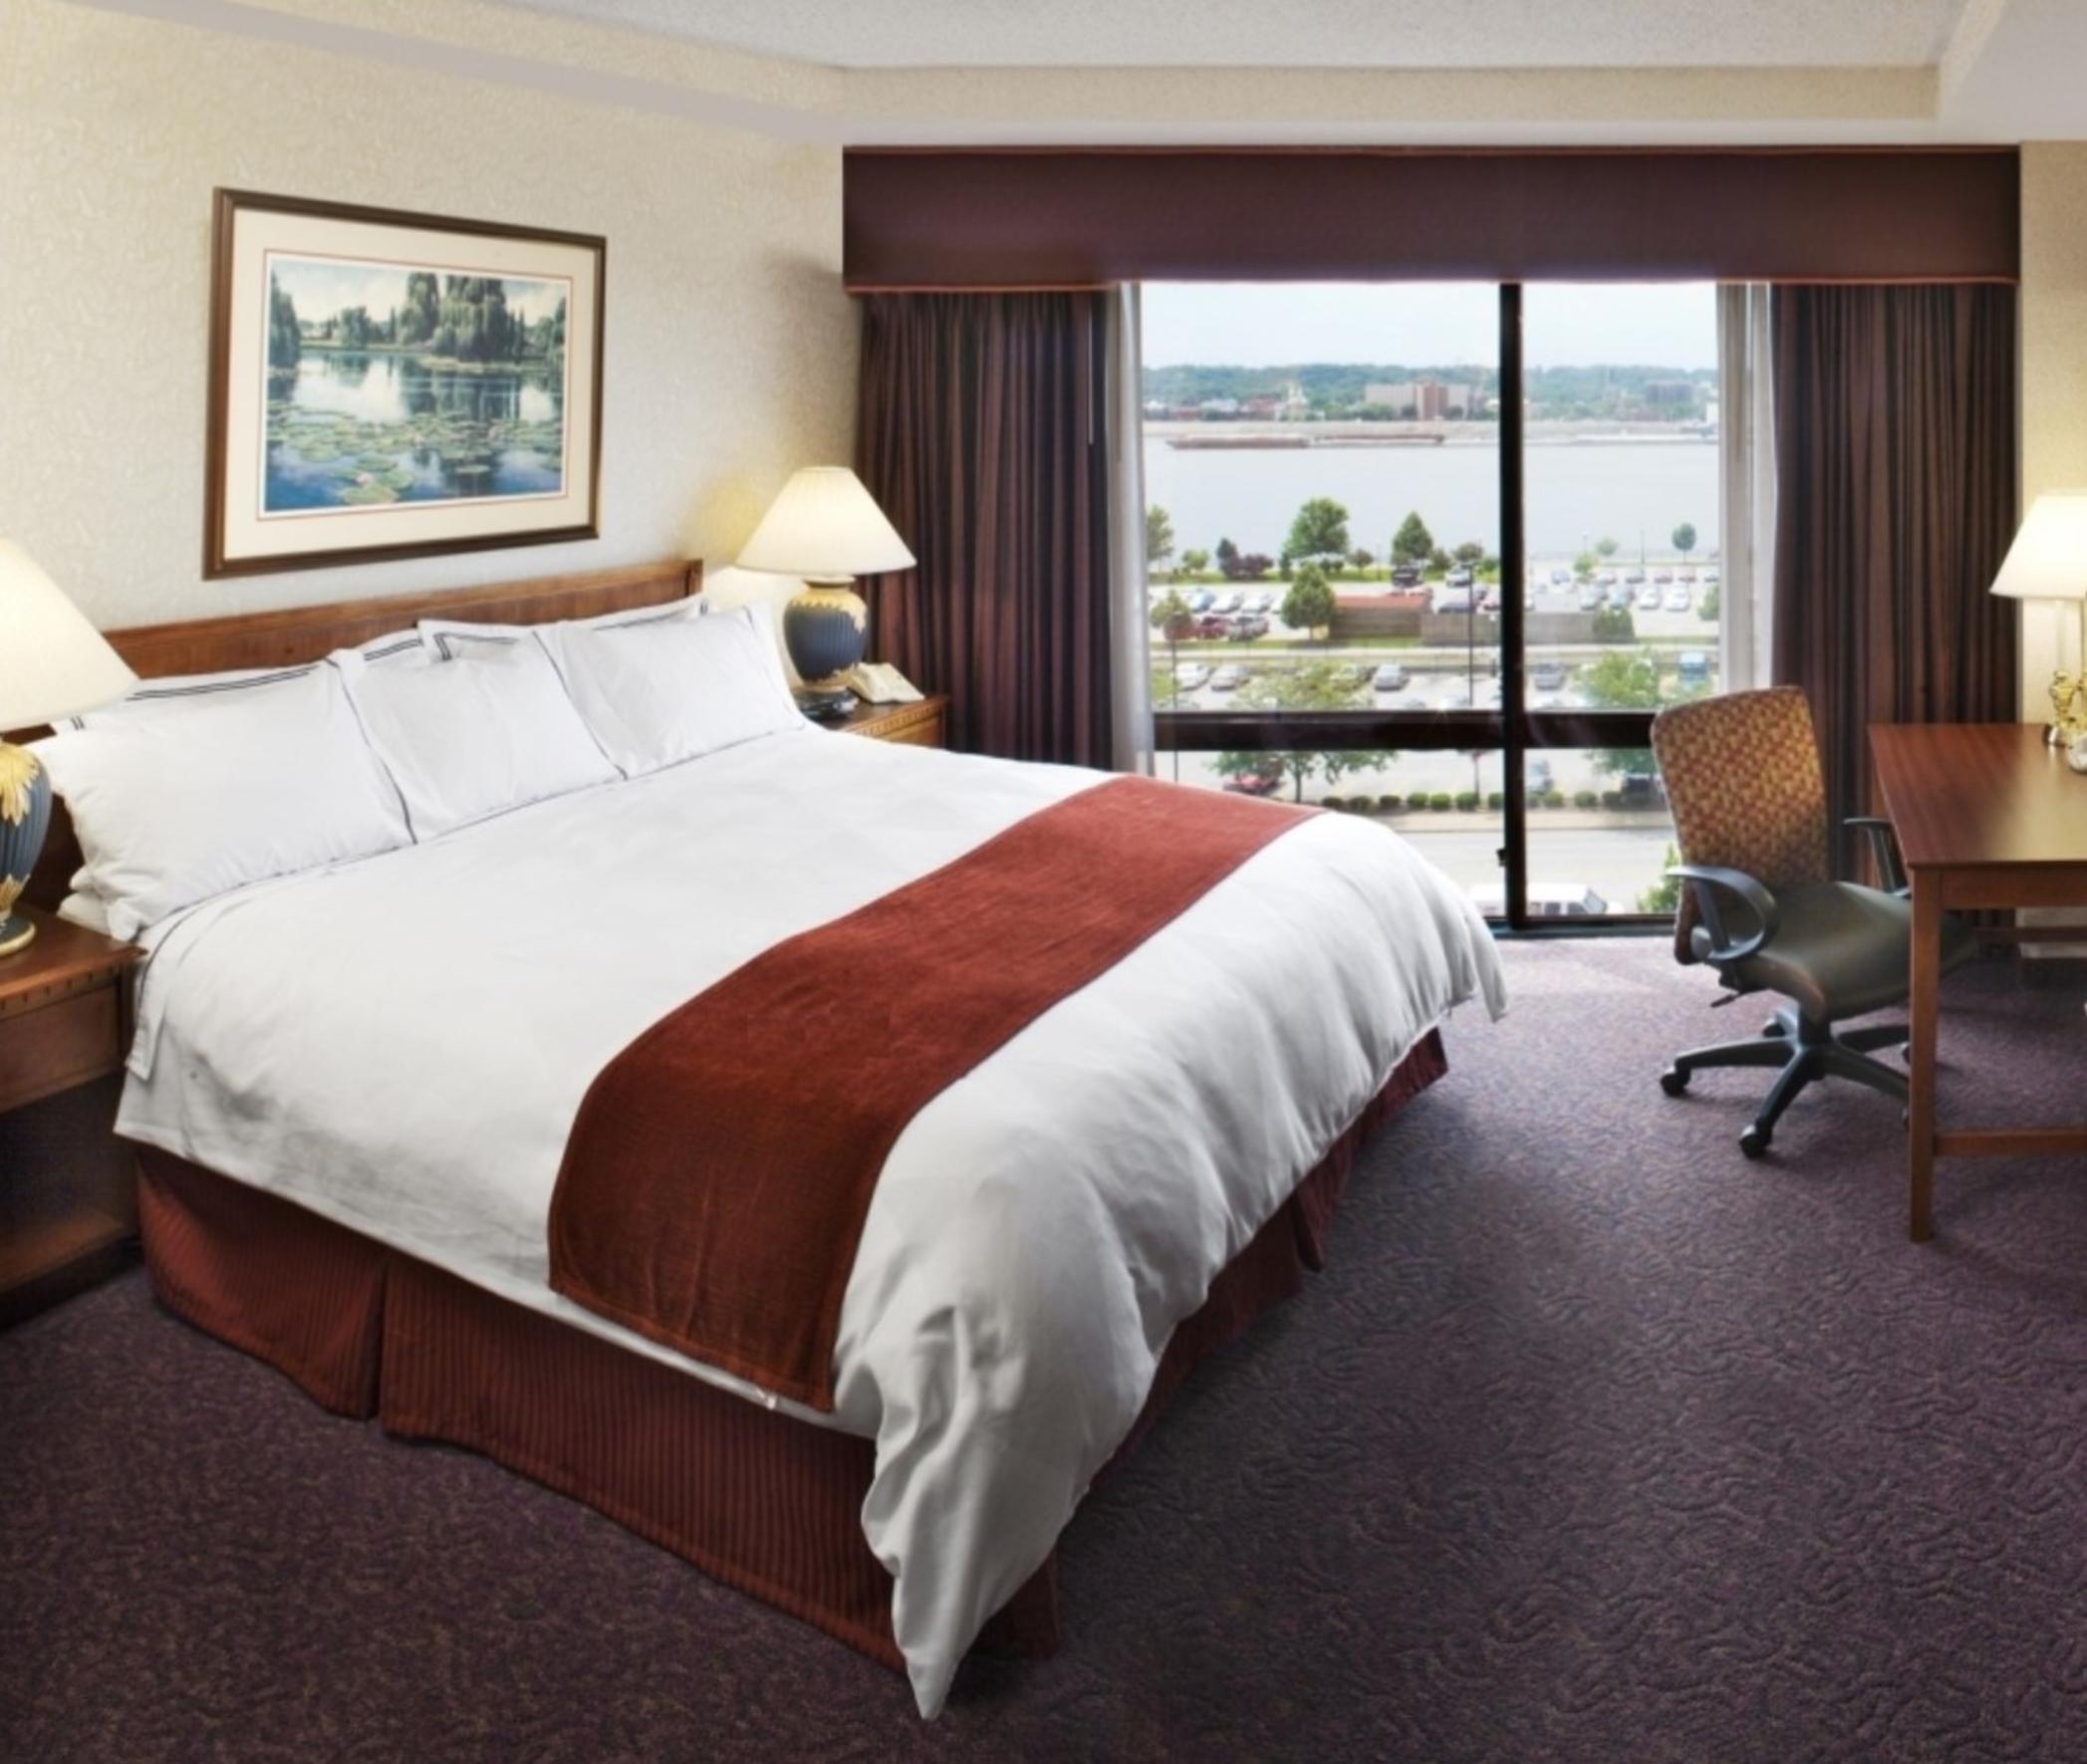 https://www.hotelsbyday.com/_data/default-hotel_image/3/15529/dvpt-80317297-king-guest-room-2095x1771.jpg